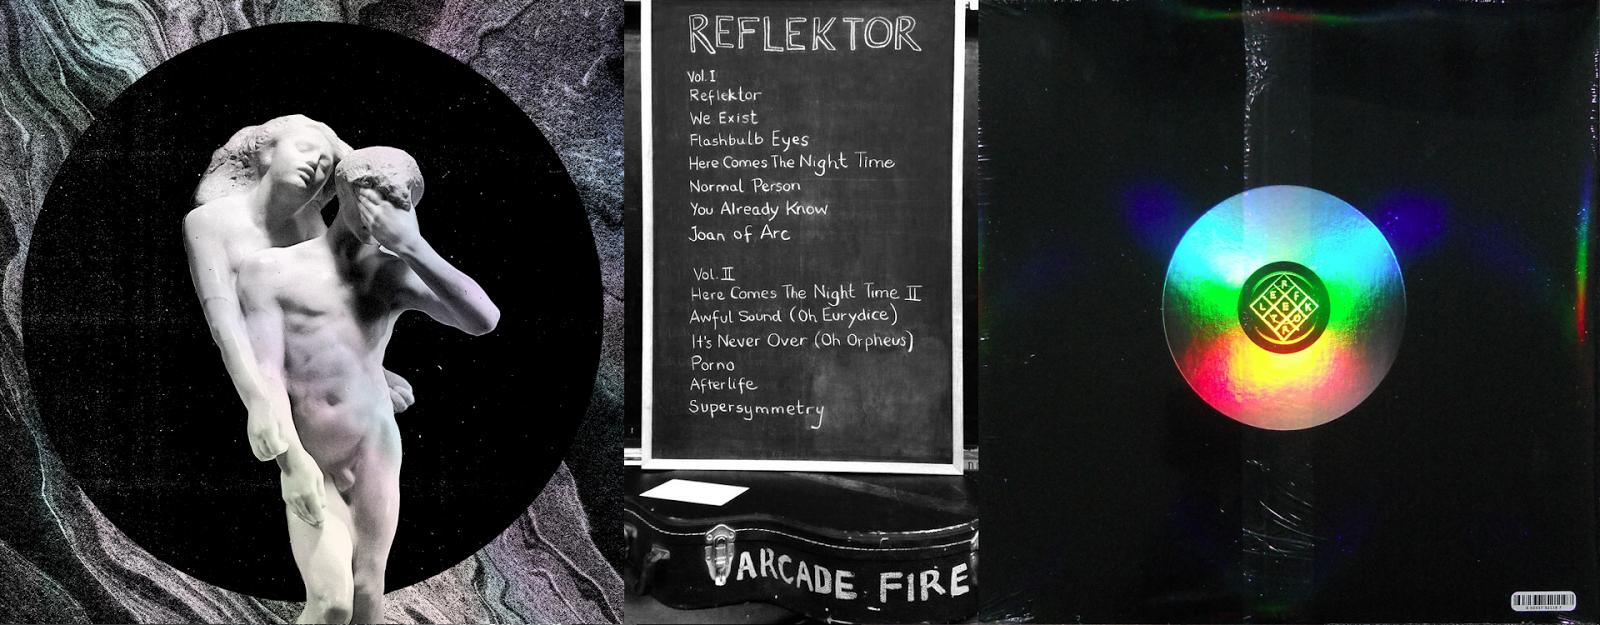 Arcade Fire - Reflektor - Amazon.com Music